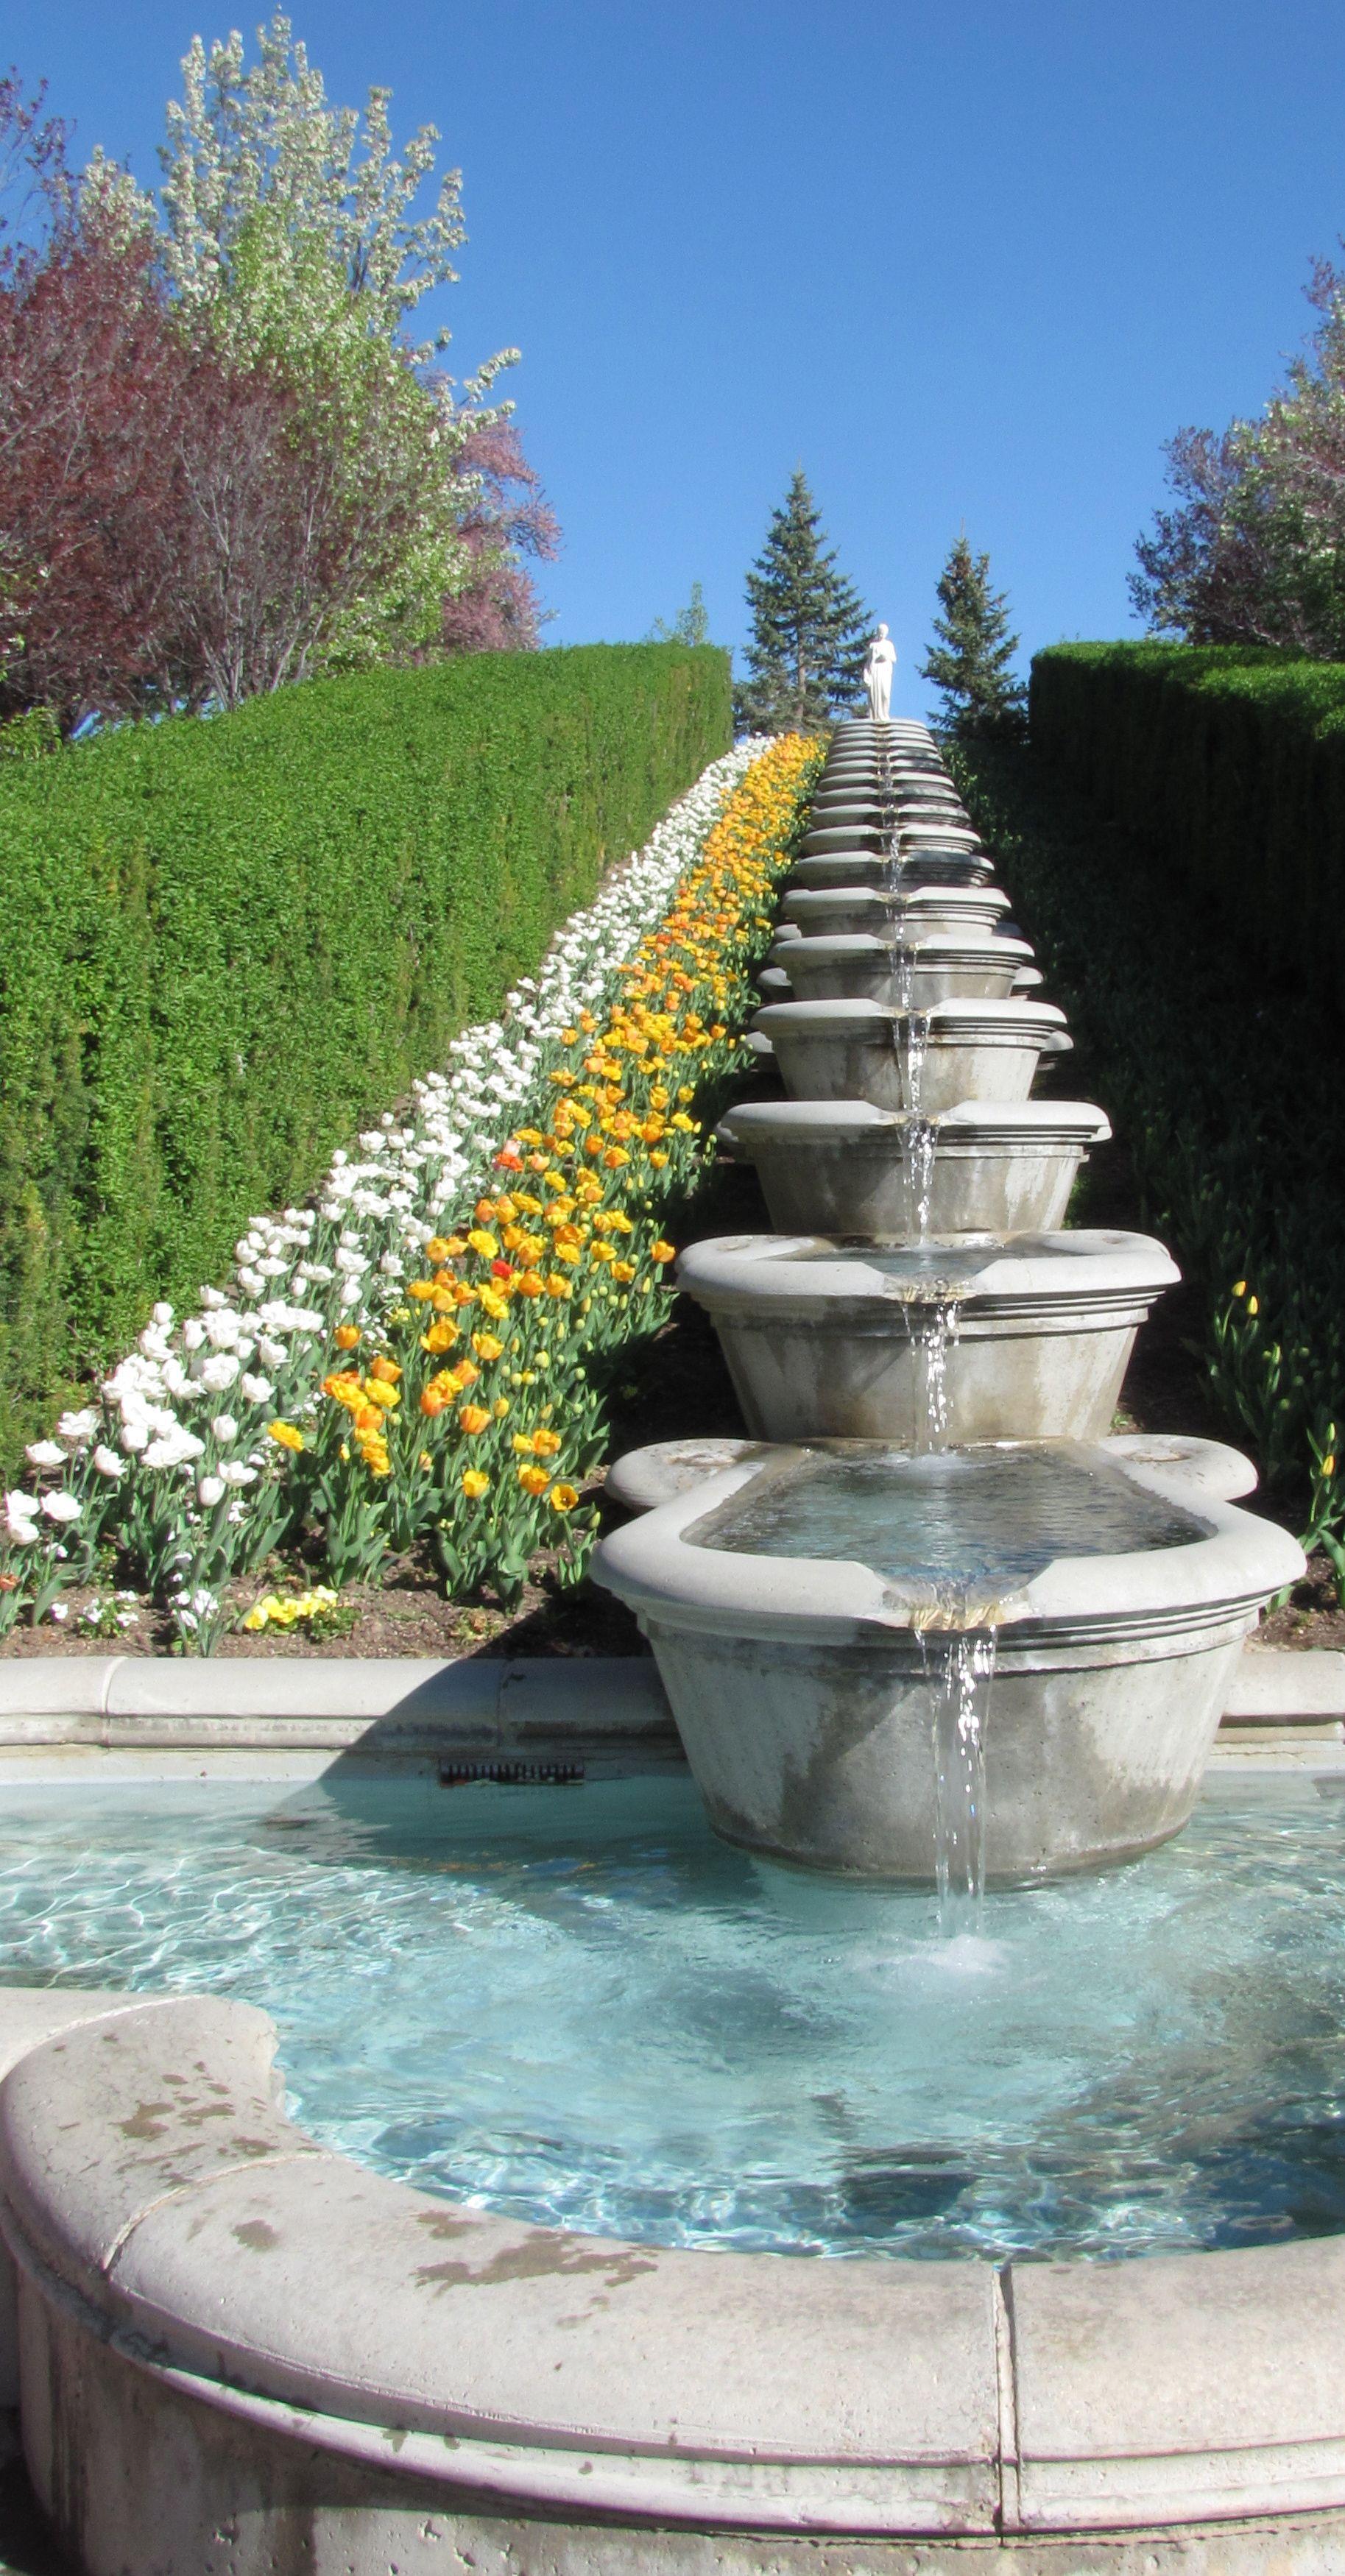 thanksgiving point gardens - lehi, utah | Places to go ...